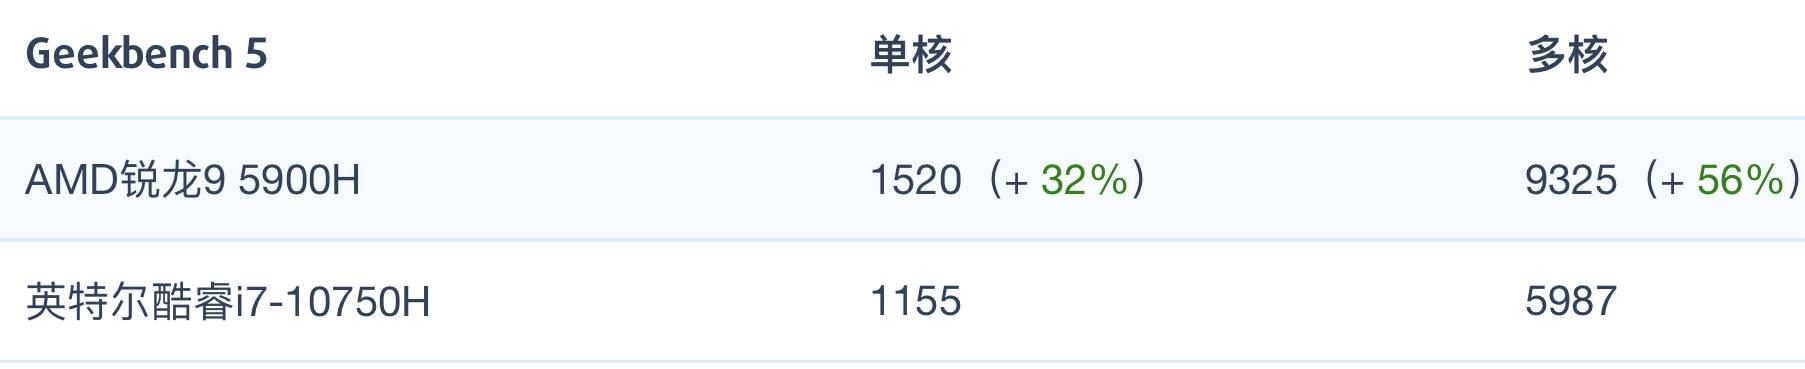 AMD锐龙R9 5900H和i7-10750H性能跑分对比评测